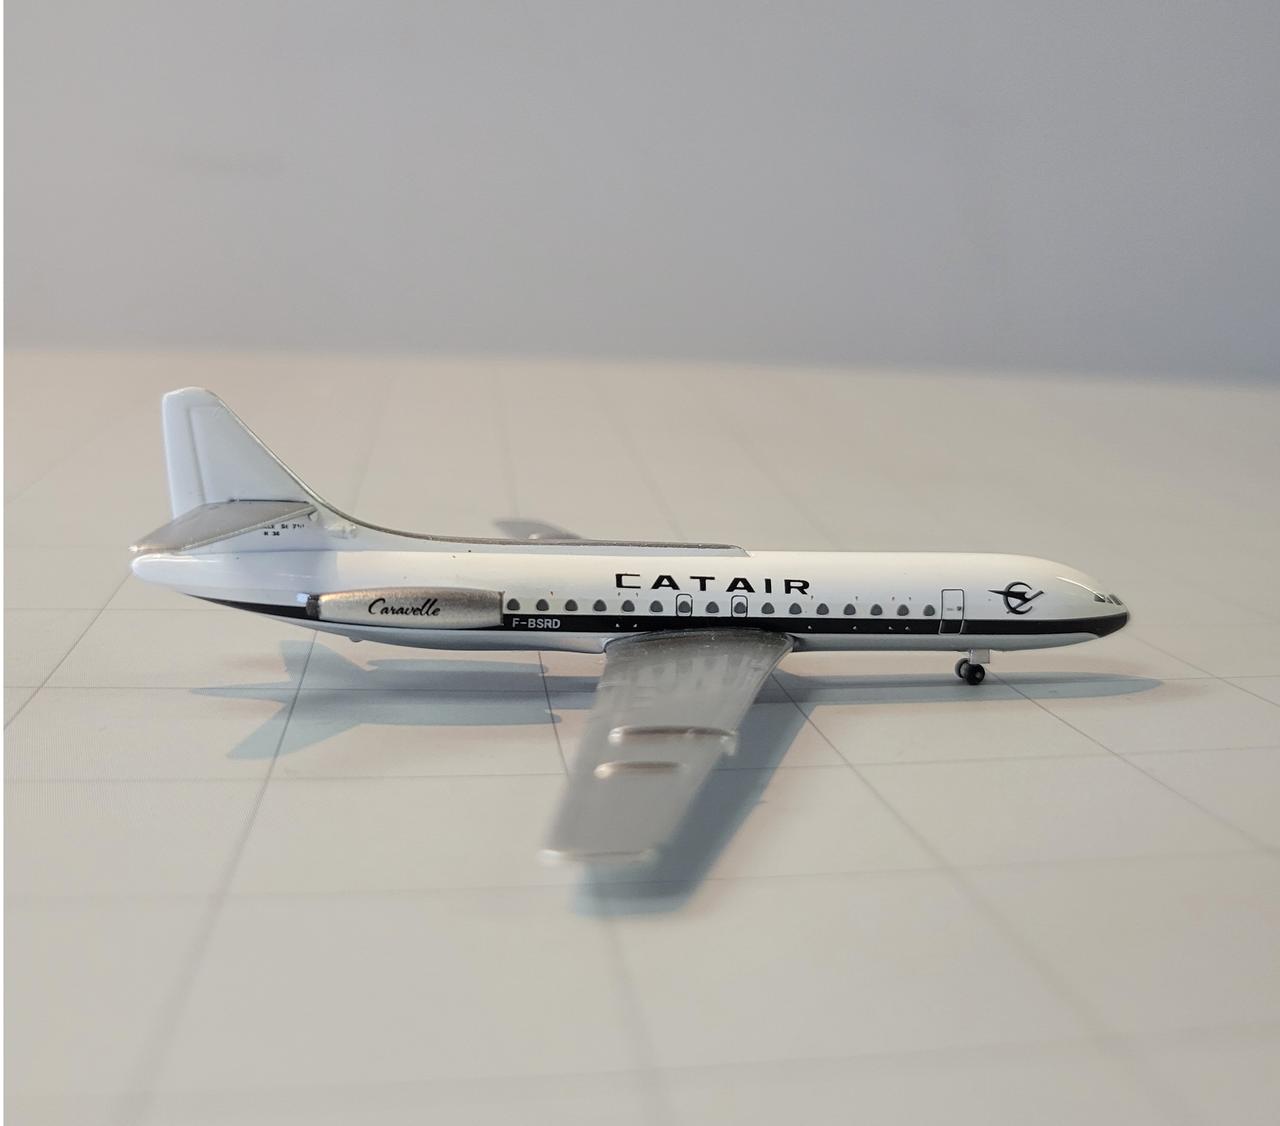 Aeroclassics 1:400 Catair SE-210 Caravelle